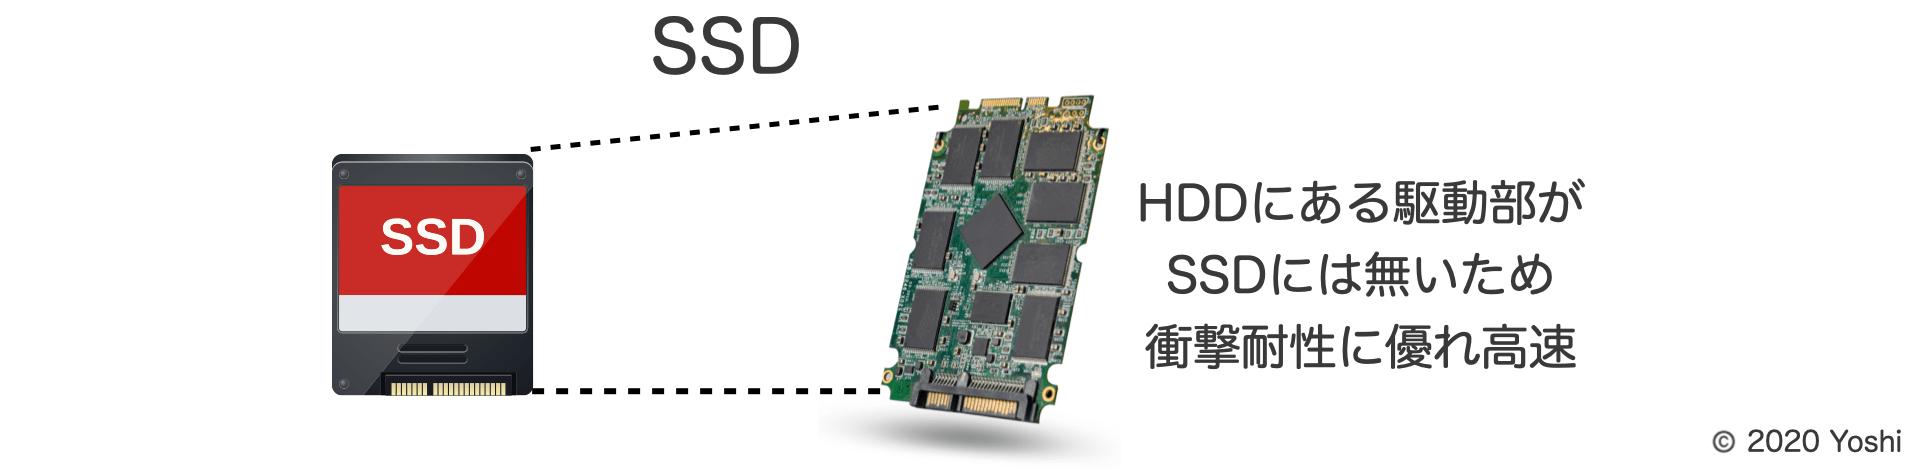 SSDは衝撃耐性に優れ高速